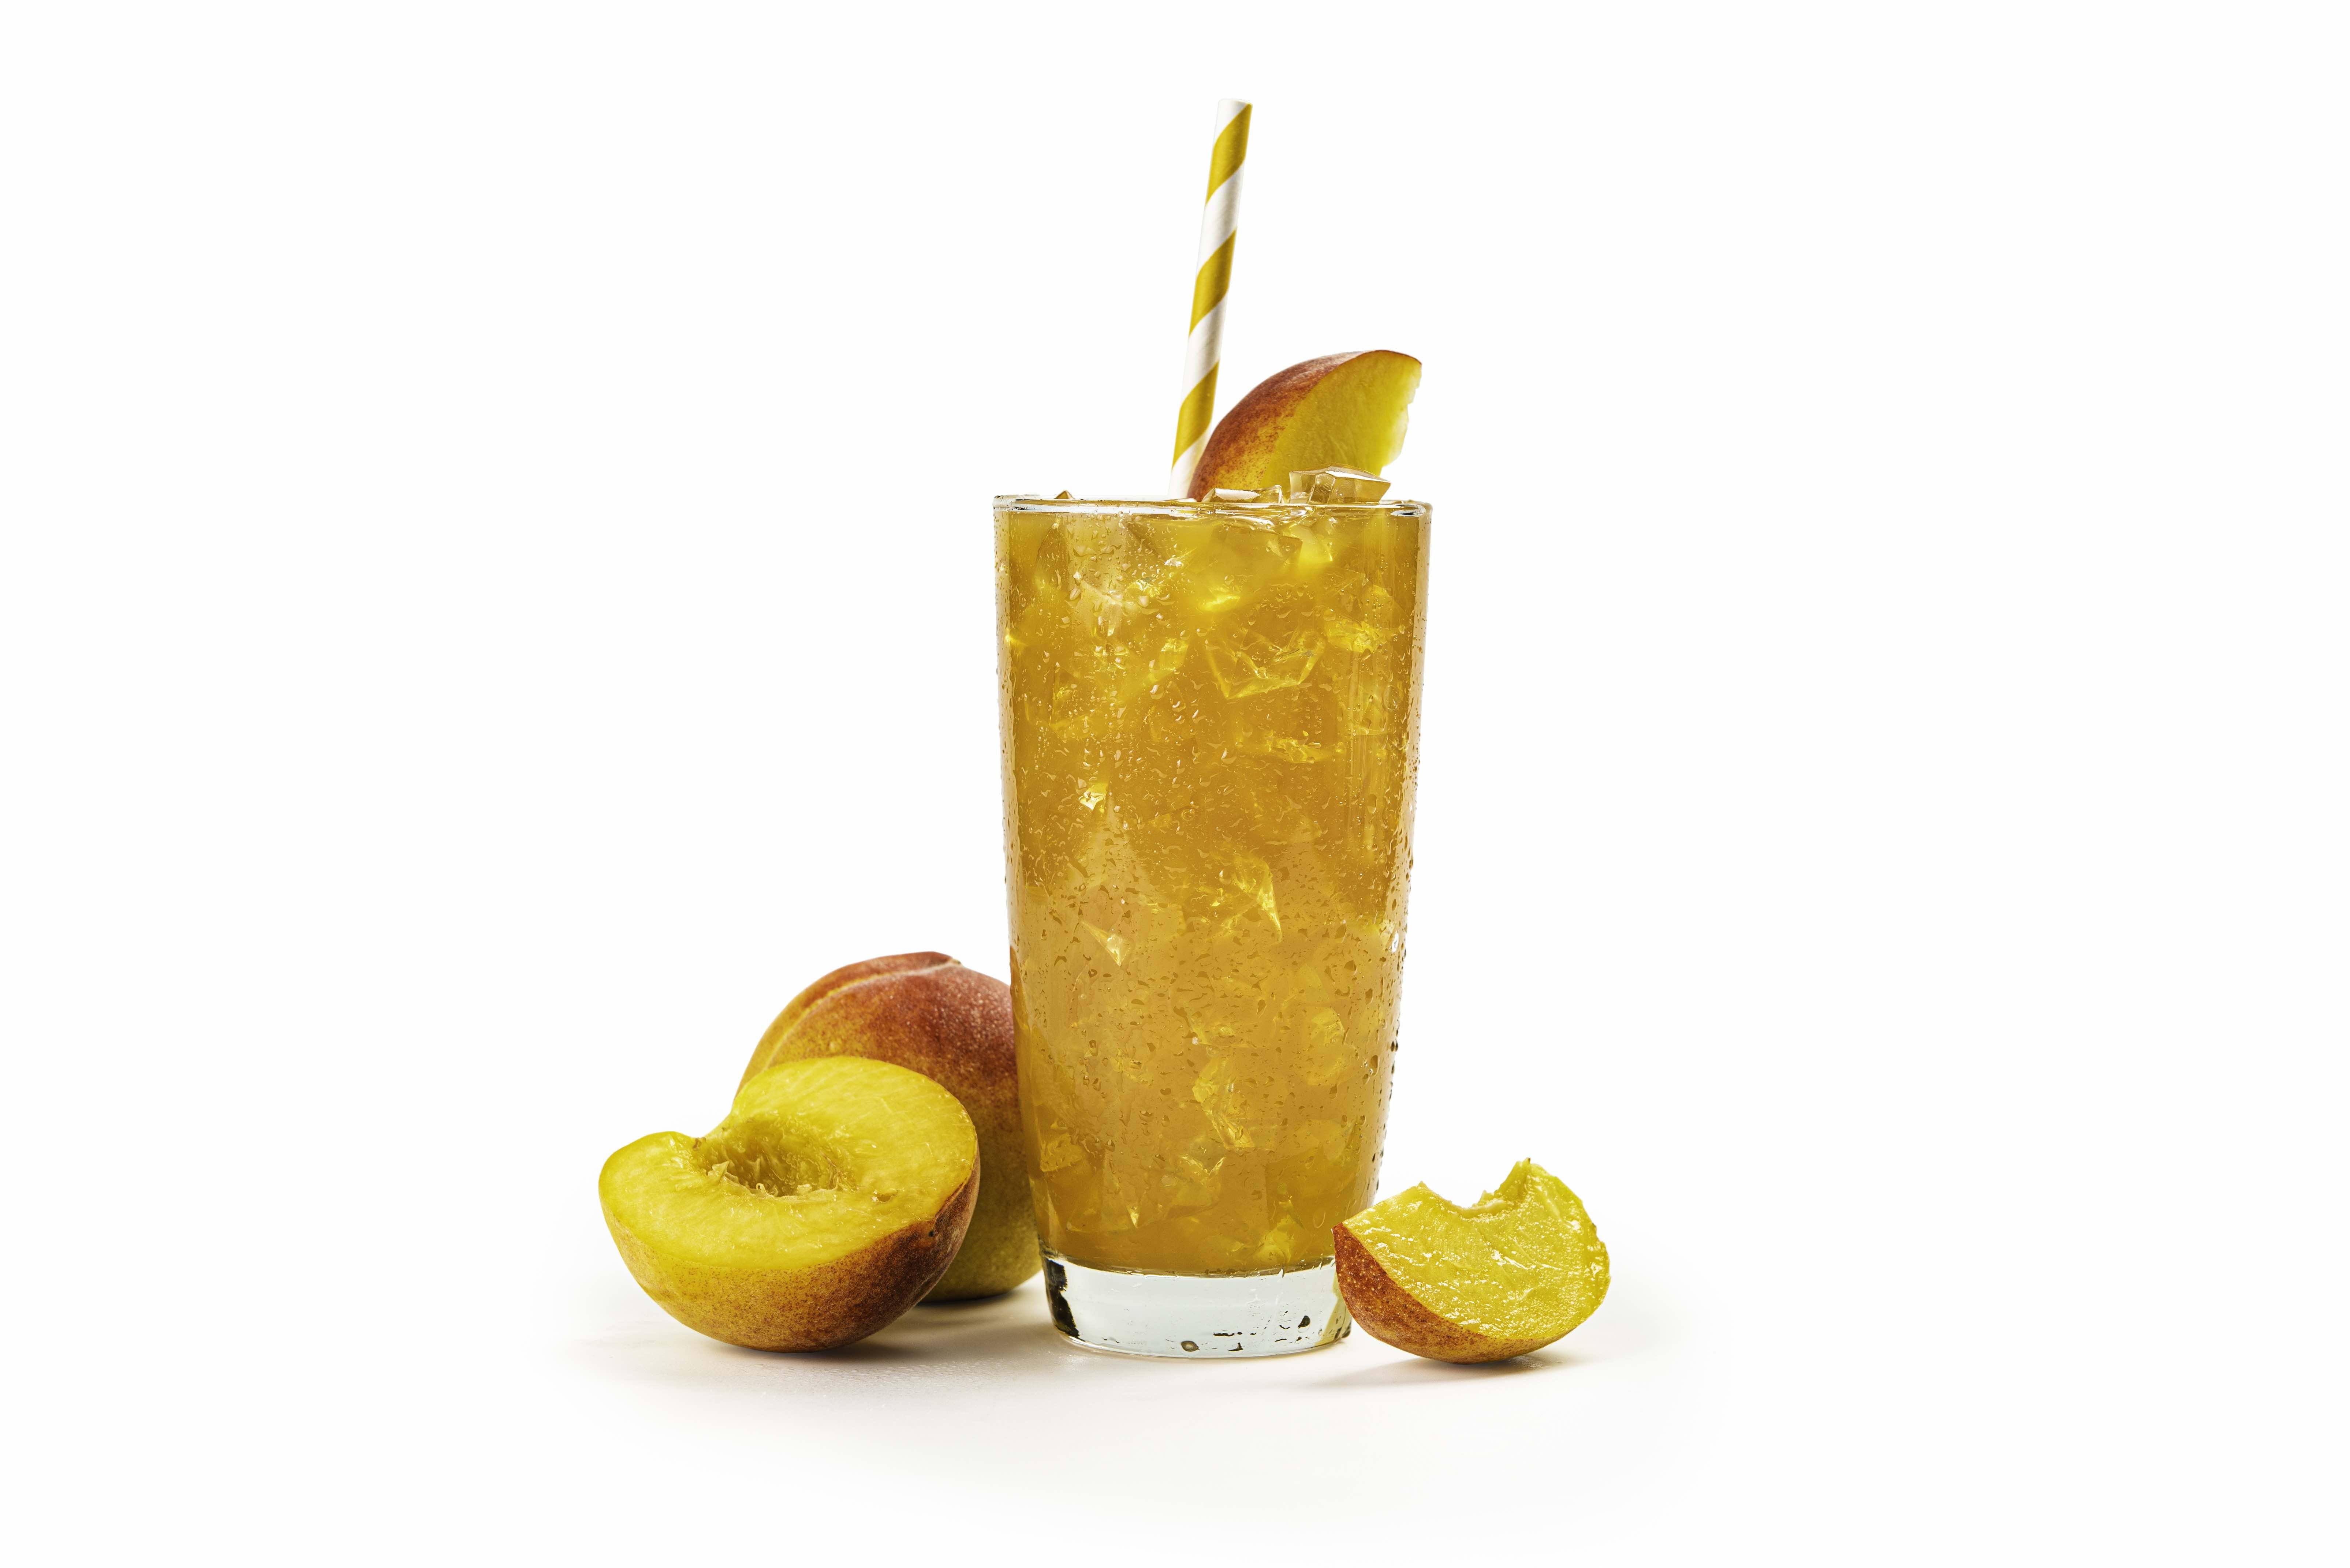 Housemade Classic and Seasonal Peach Iced-Tea